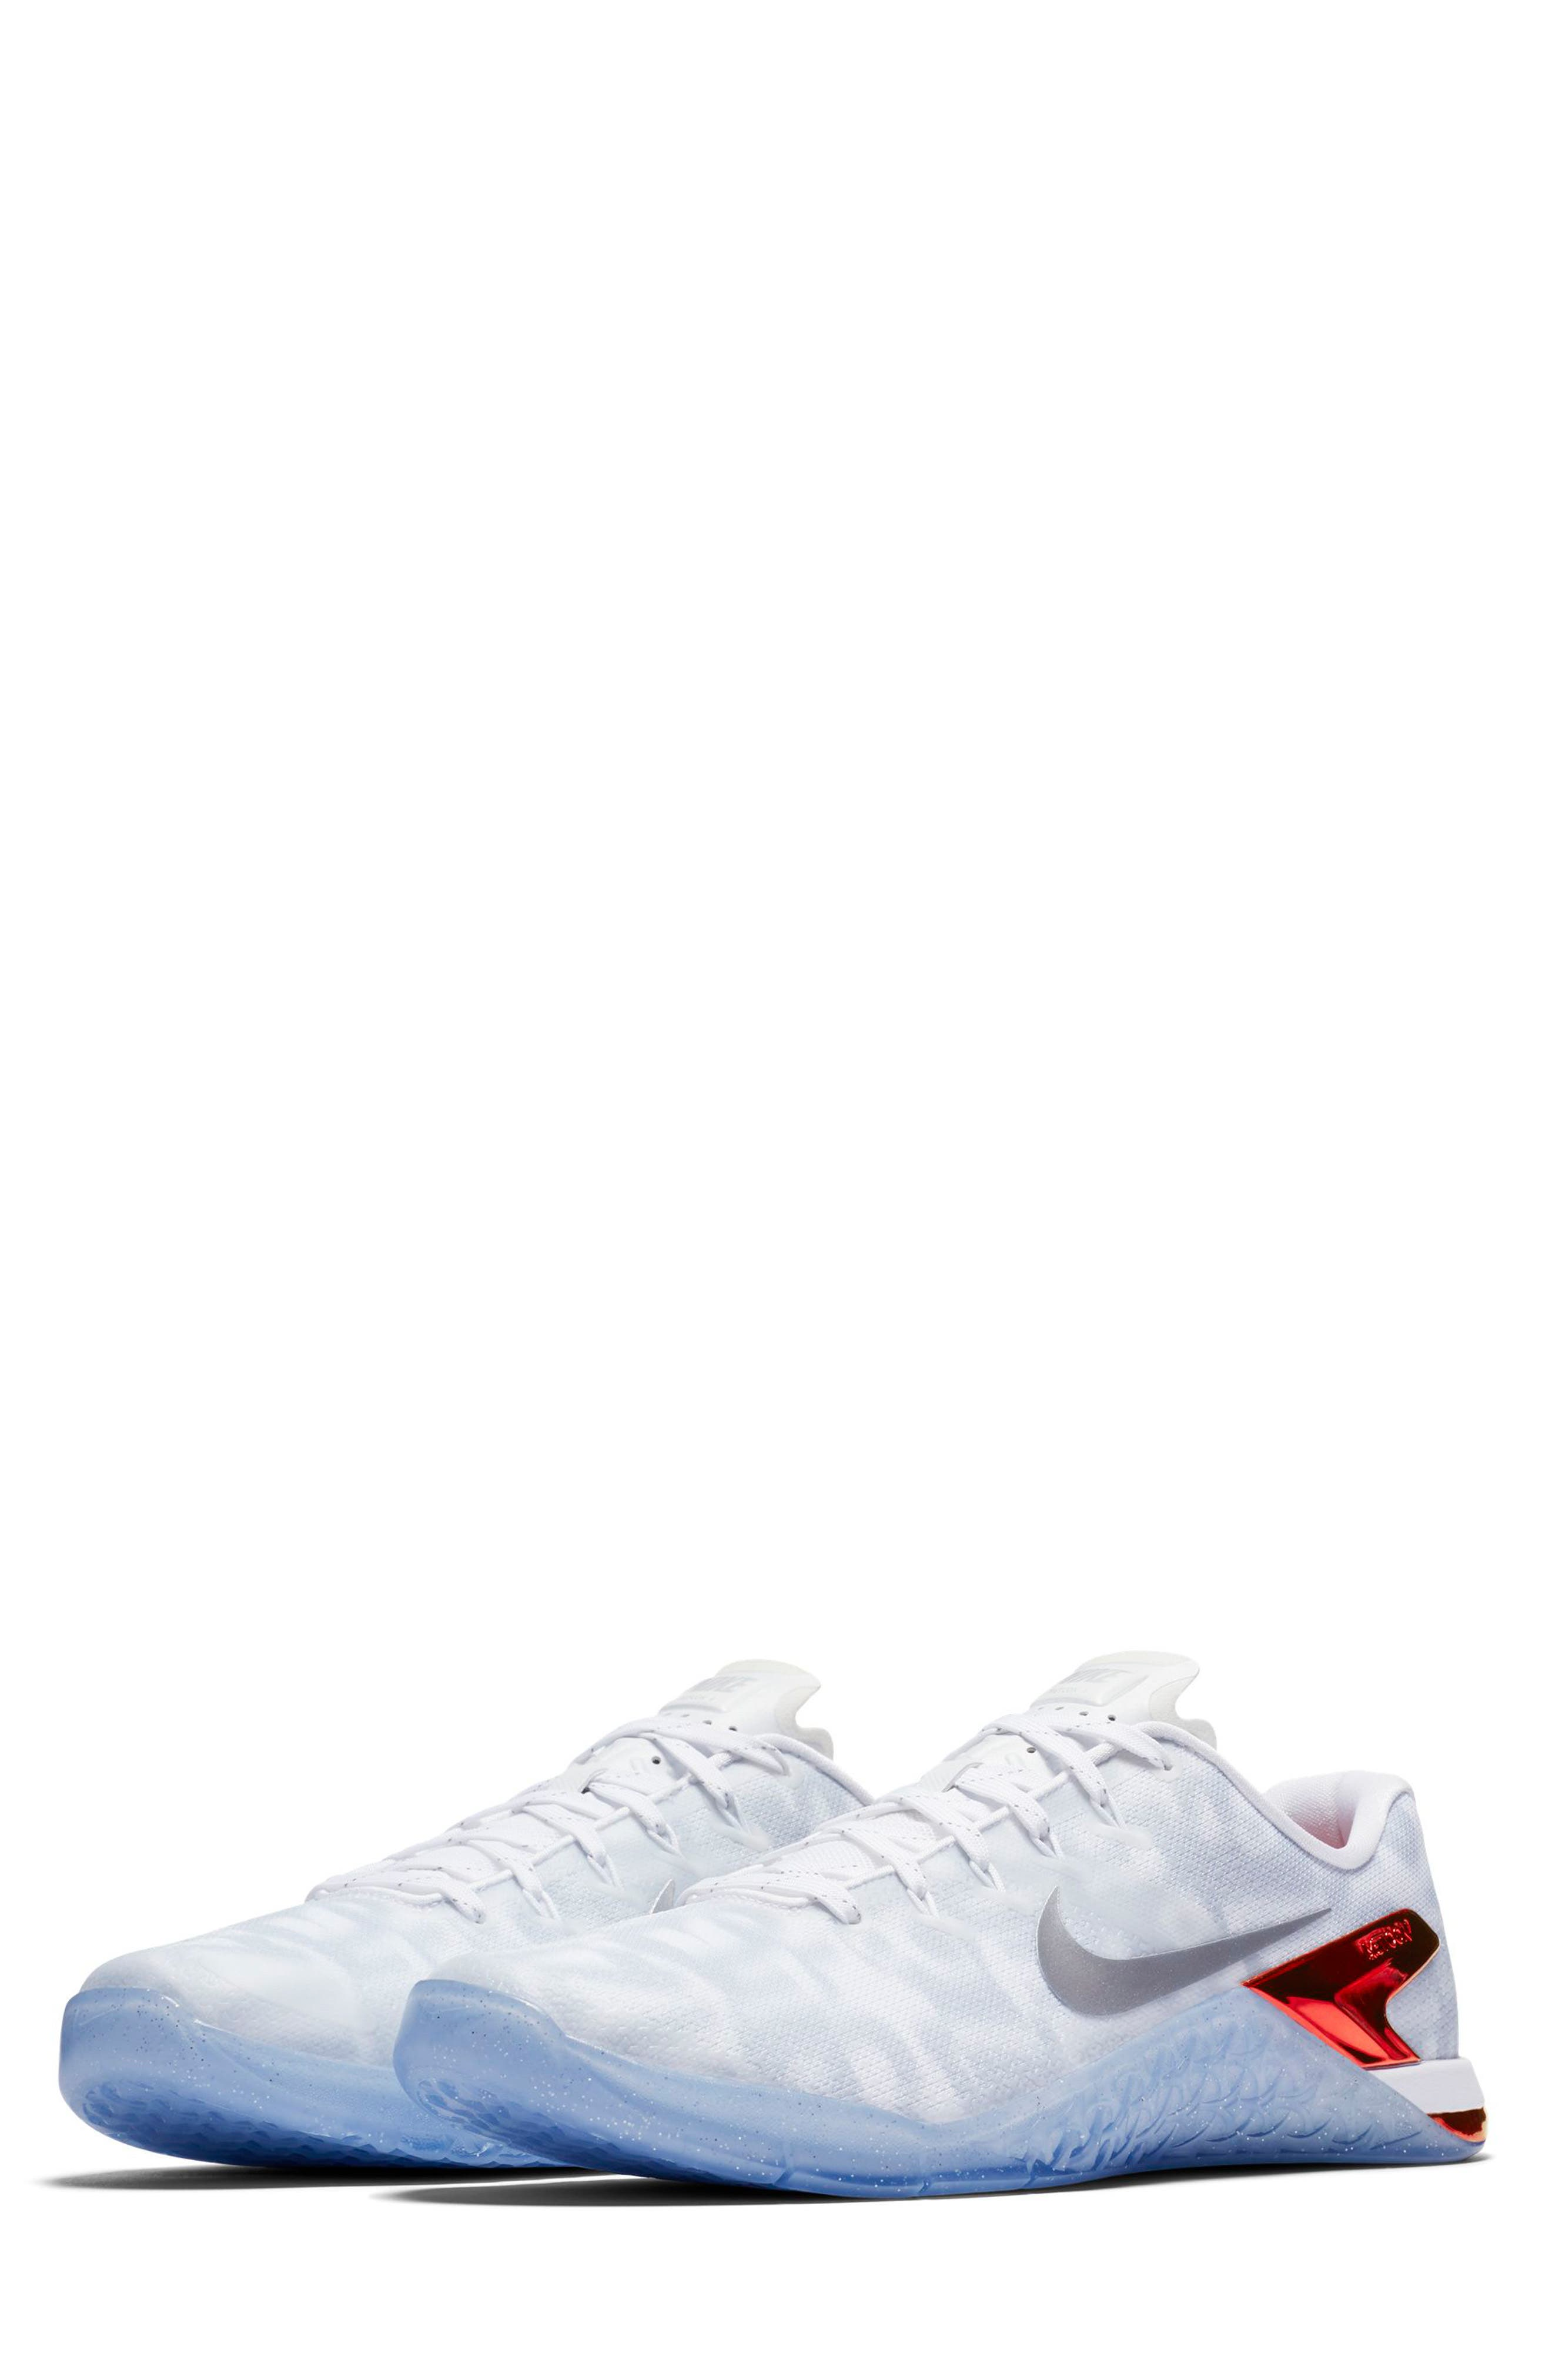 Nike Metcon 4 Premium Training Shoe